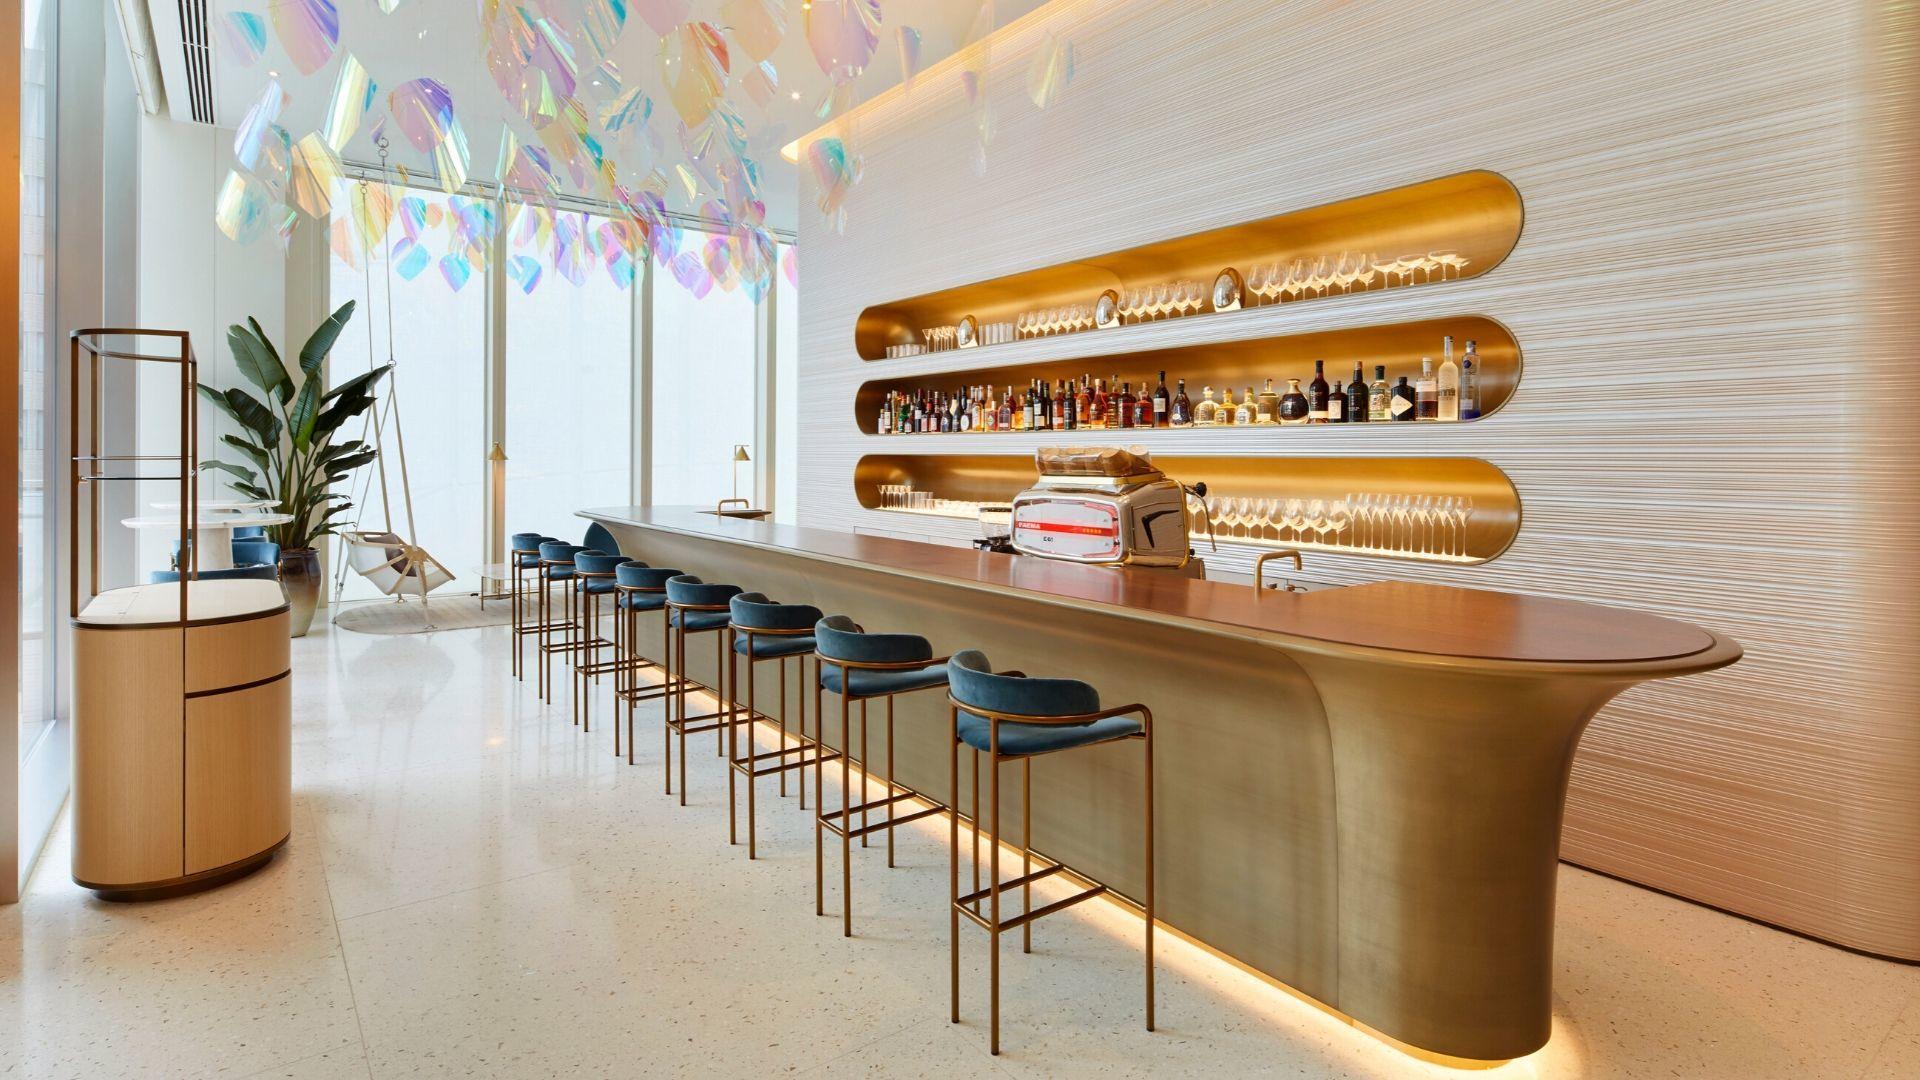 Inside Louis Vuitton's First-Ever Café And Restaurant